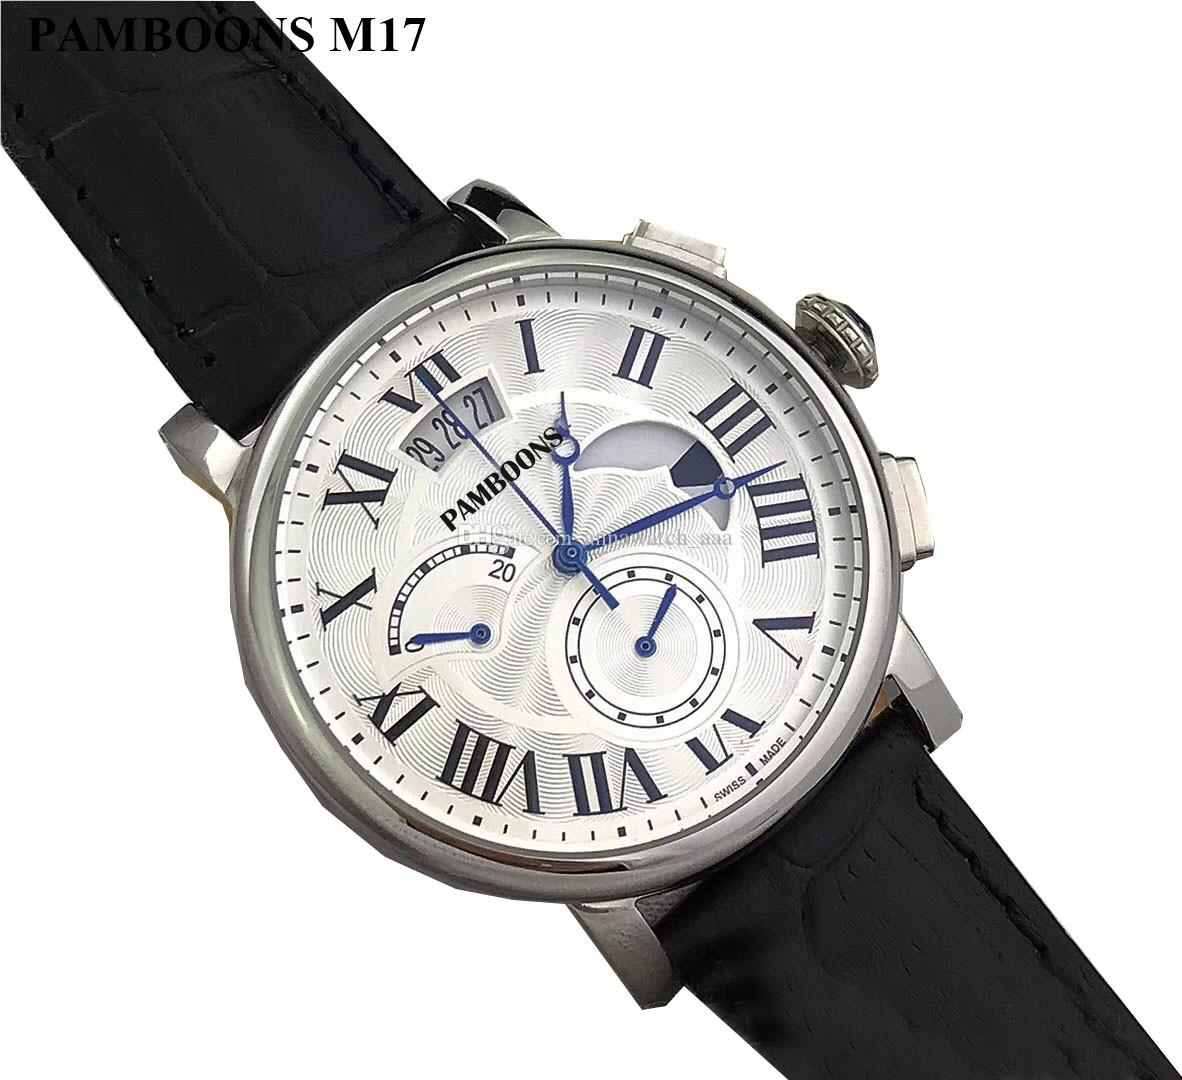 c5e8554e3de Compre 2018 Moda De Luxo Da Marca Relógio Suíço De Couro Tourbillon Relógio  Automático Dos Homens Relógio De Pulso Dos Homens De Aço Mecânico Relógios  ...